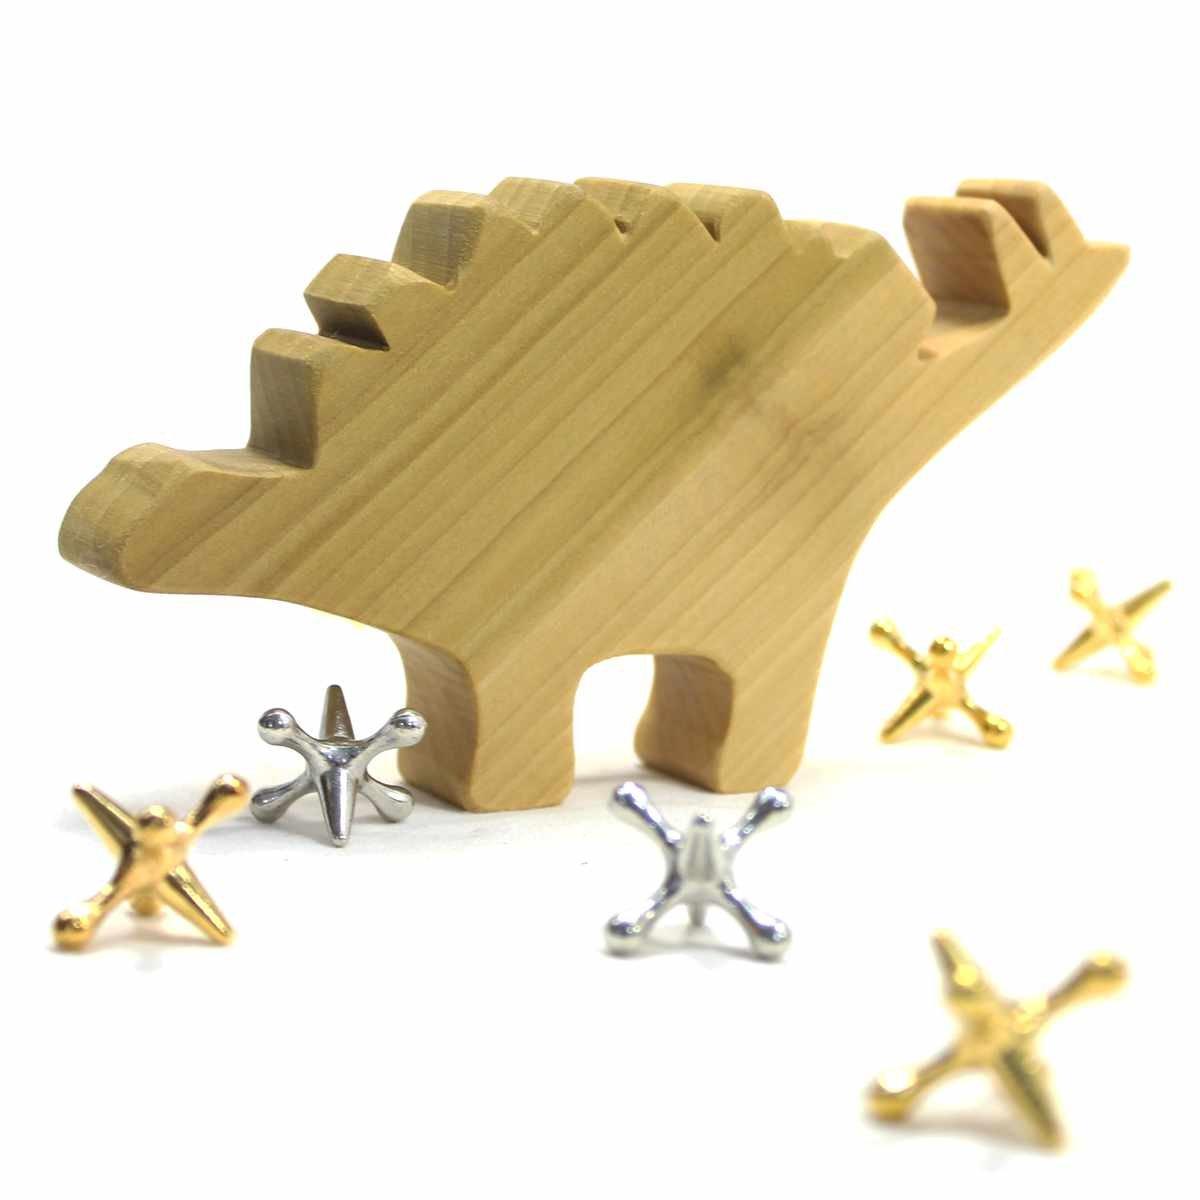 Dinosaur Toy Stegosaurus